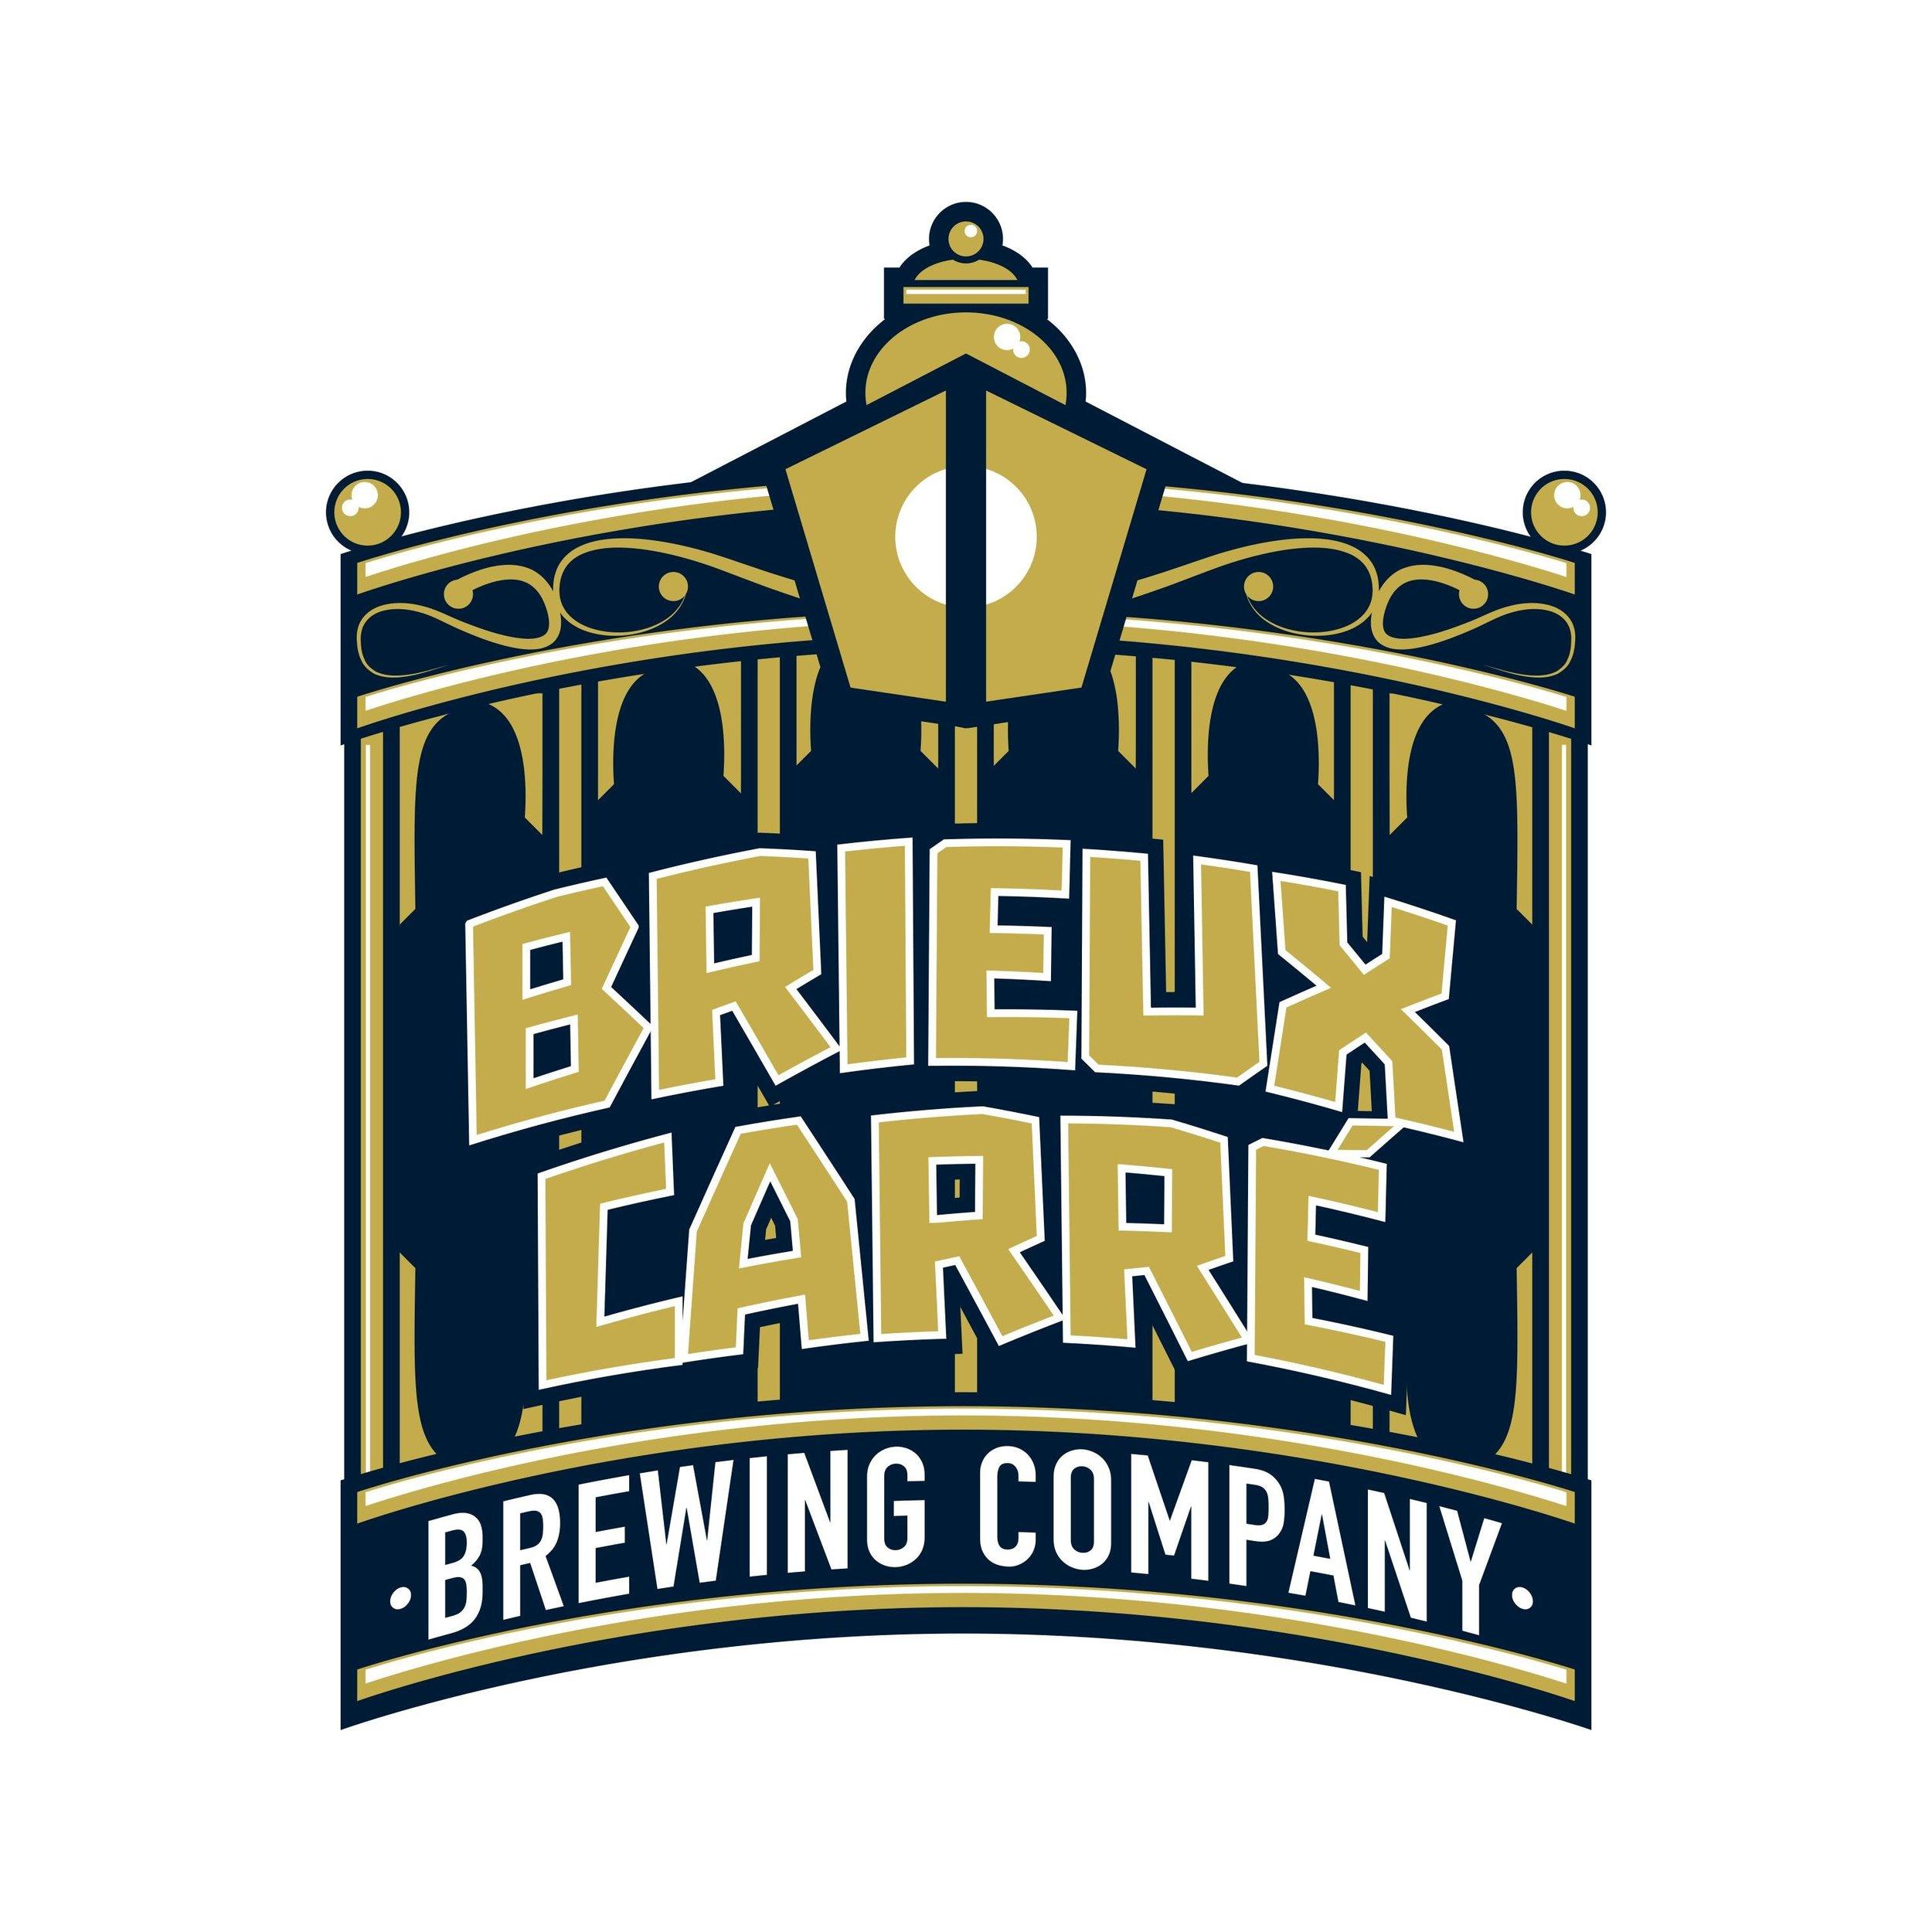 Brieux Carré Brewing Company